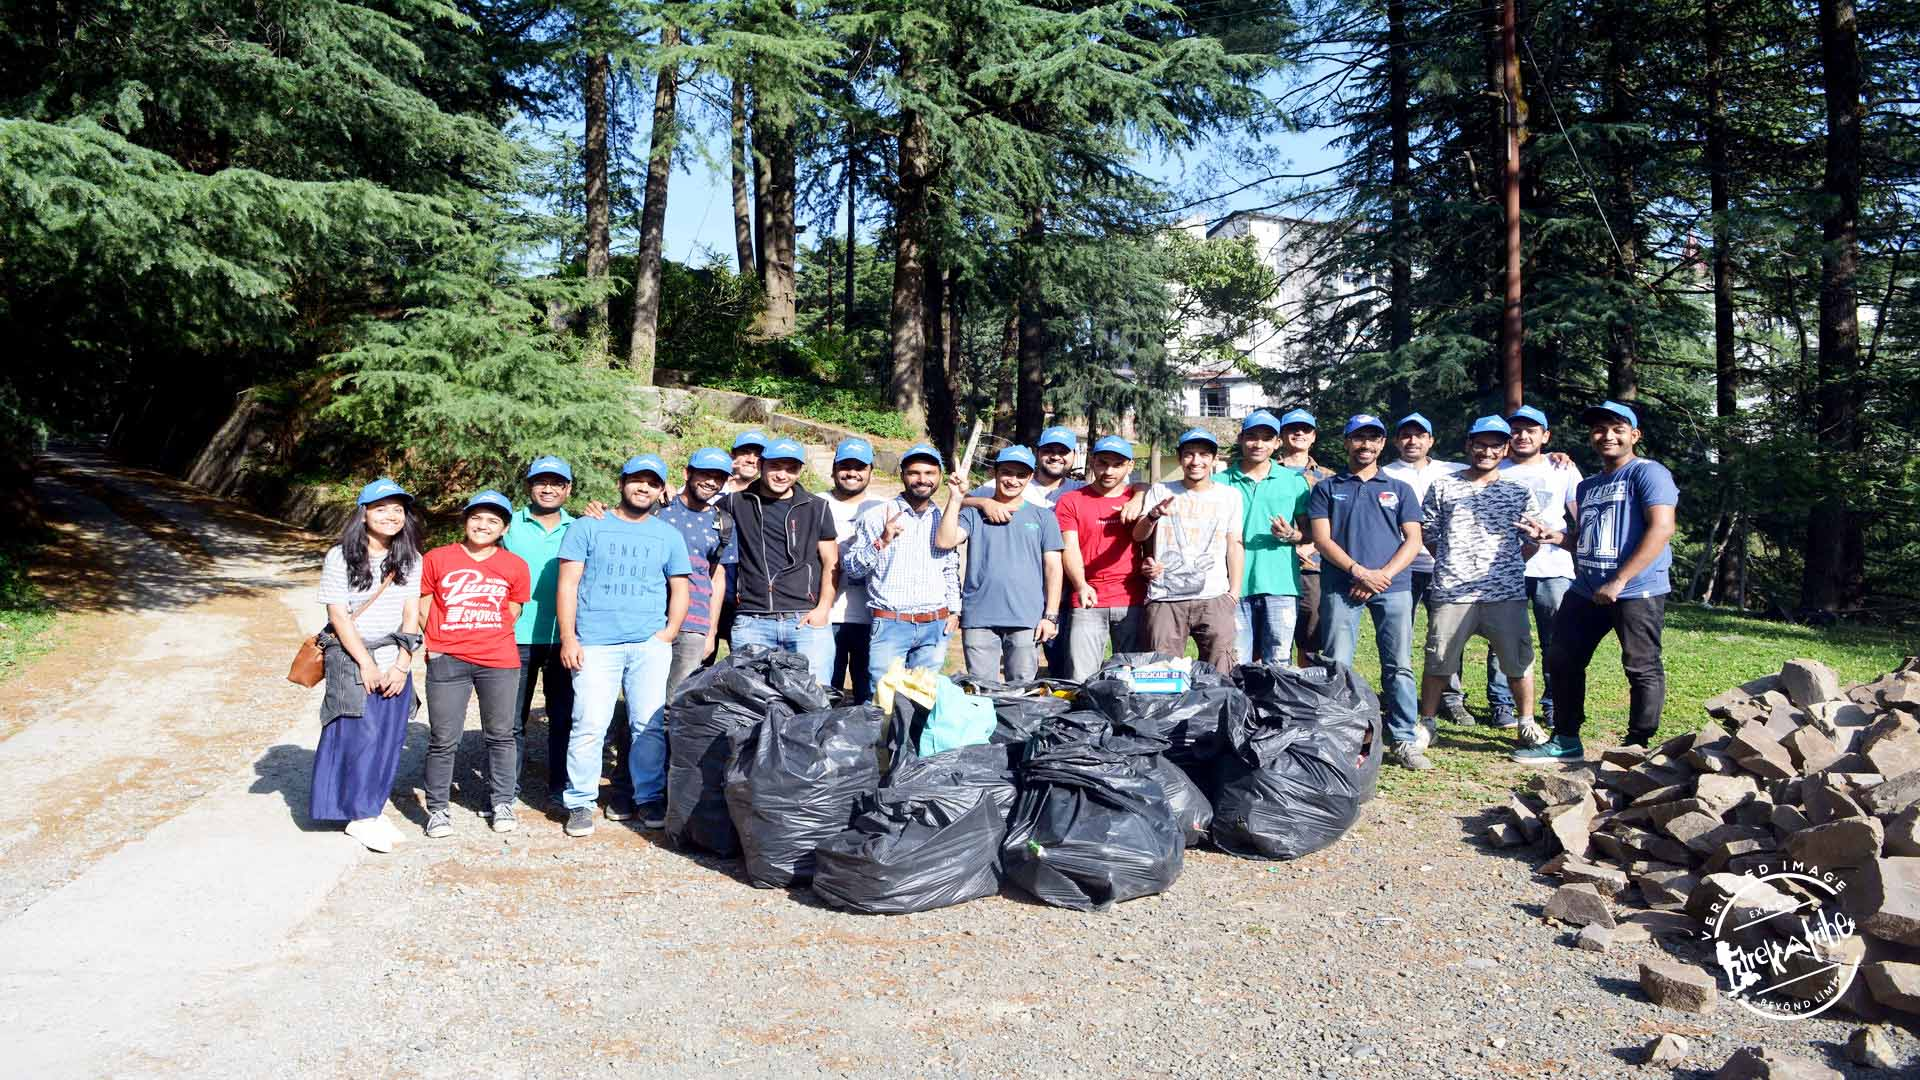 rsz cleanliness drive shimla hills - Trekatribe